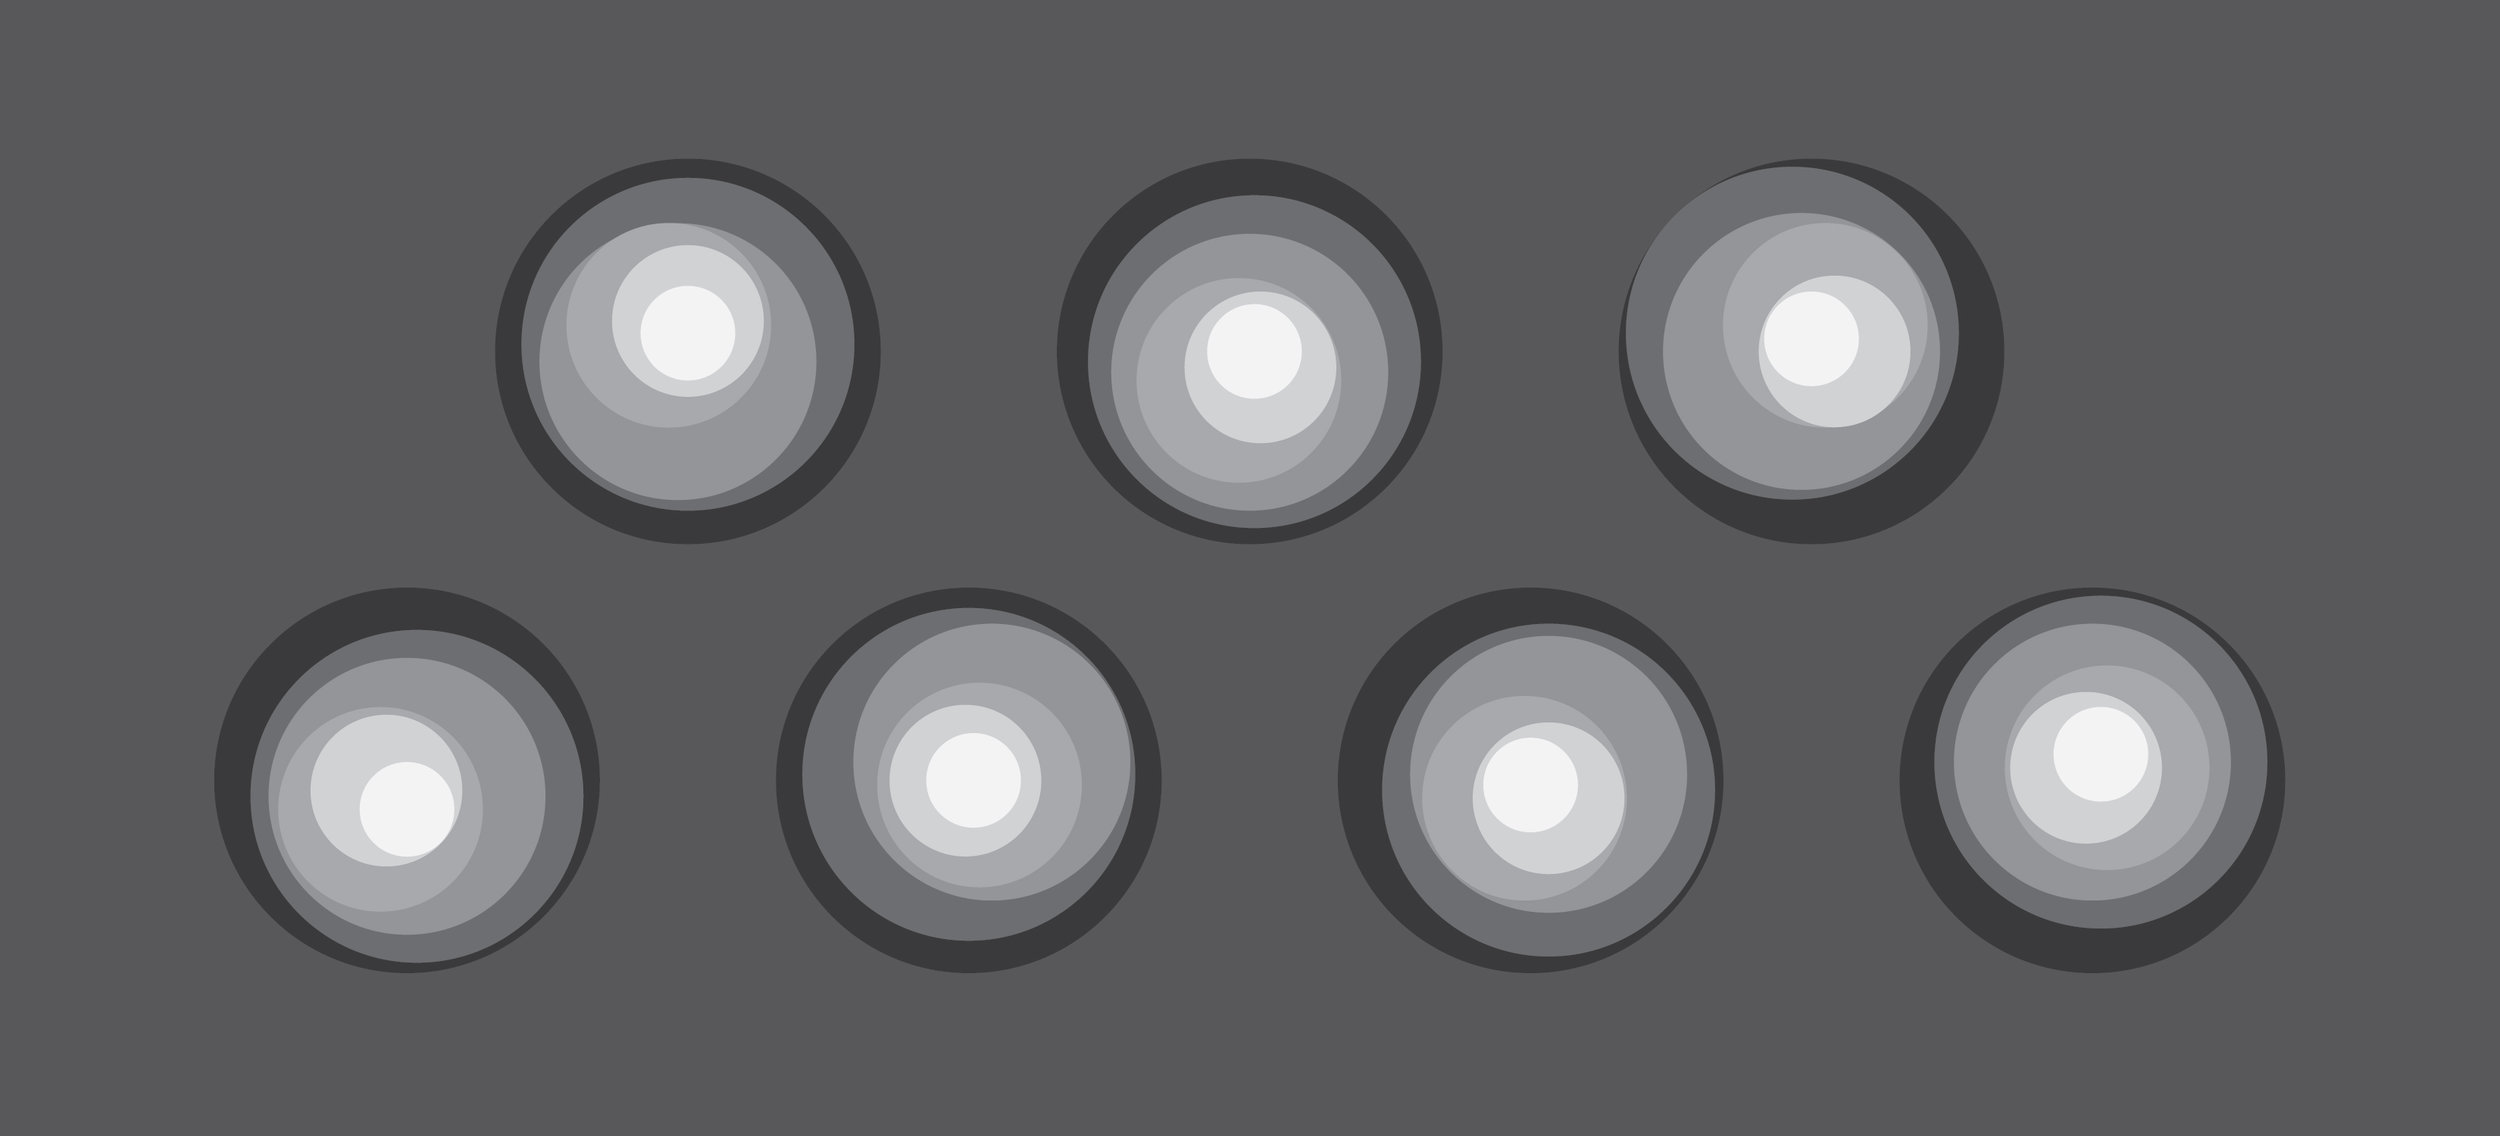 The random light effect looks like raindrops hitting water to create water ripples. -